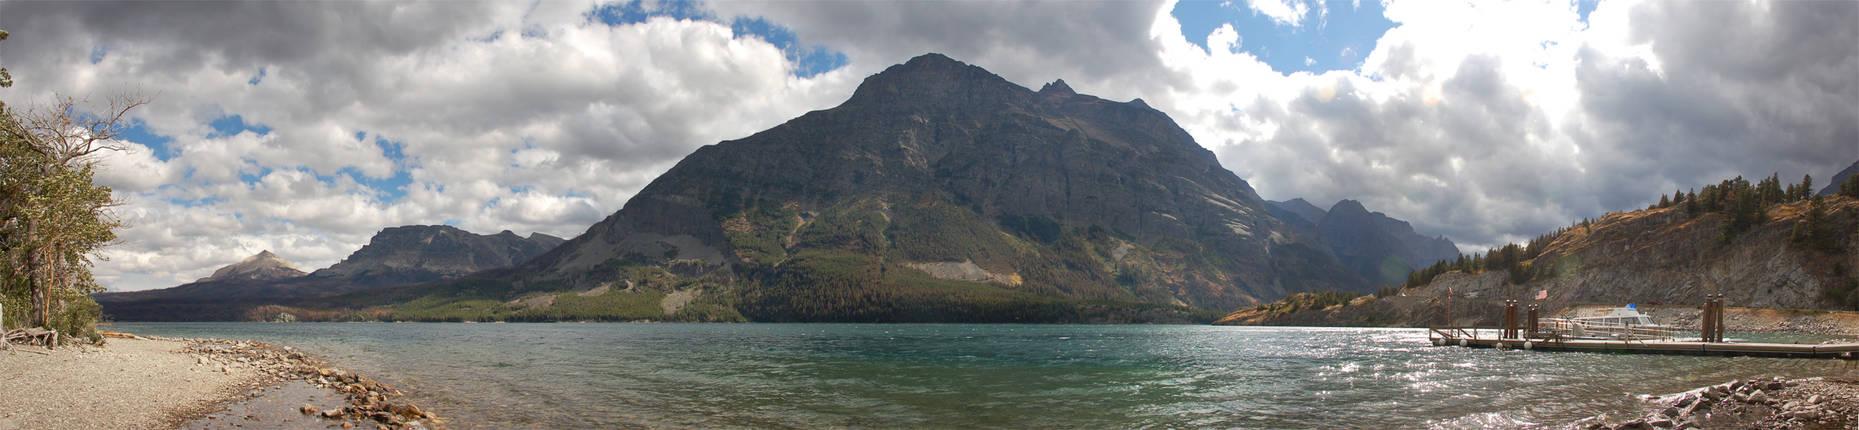 Saint Mary Lake 3 2007-08-20